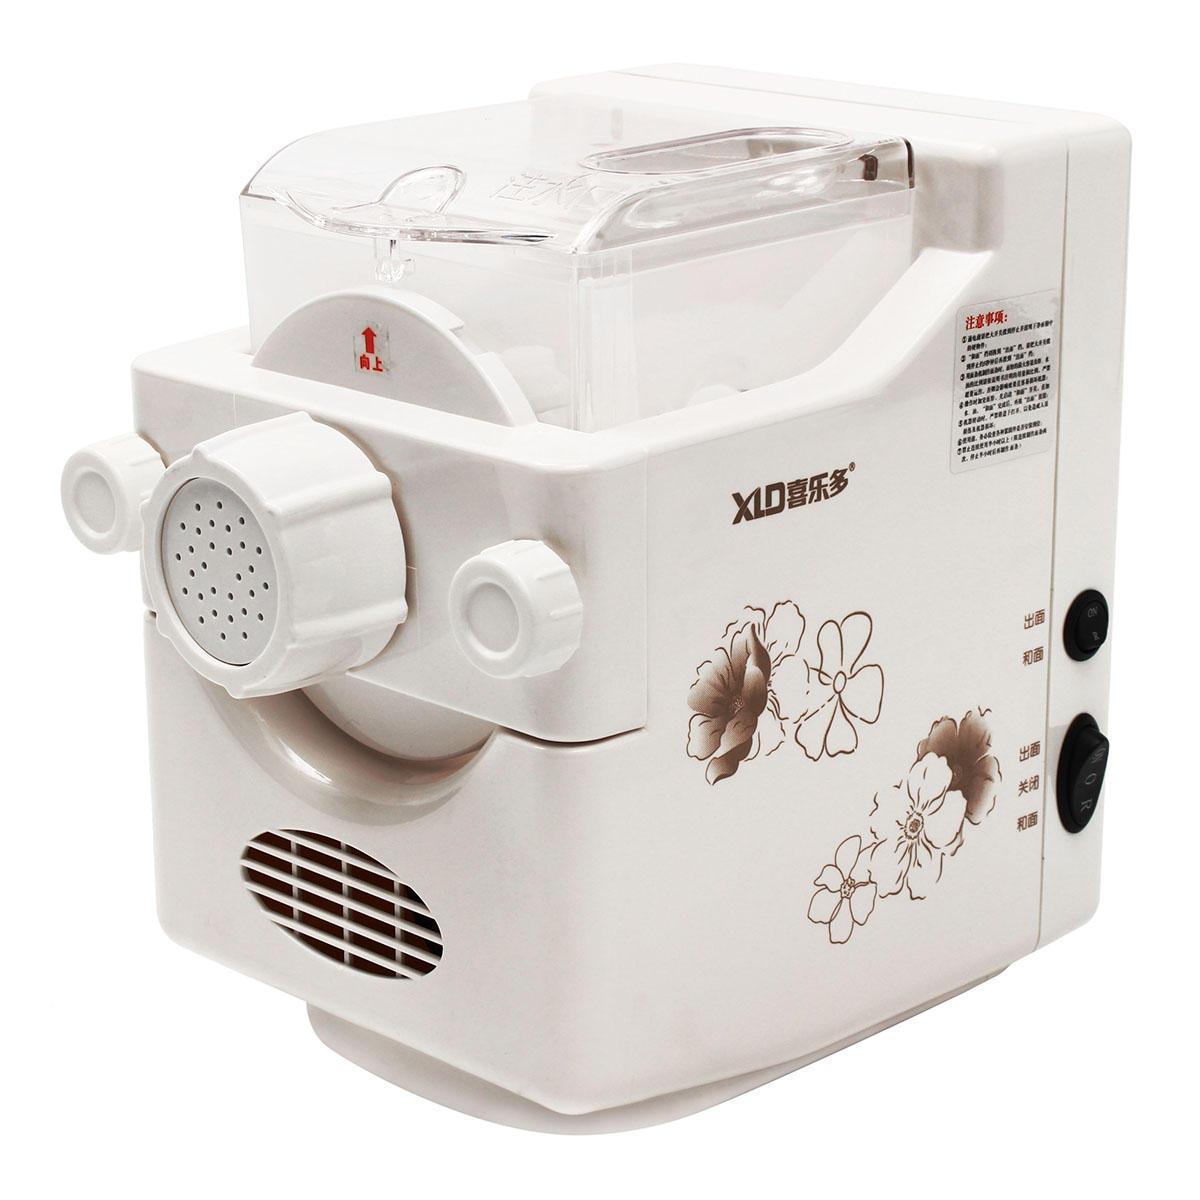 hight resolution of xld kitchen pasta noodle maker spaghetti roller cutter machine motor attachment set pizza cutter cod